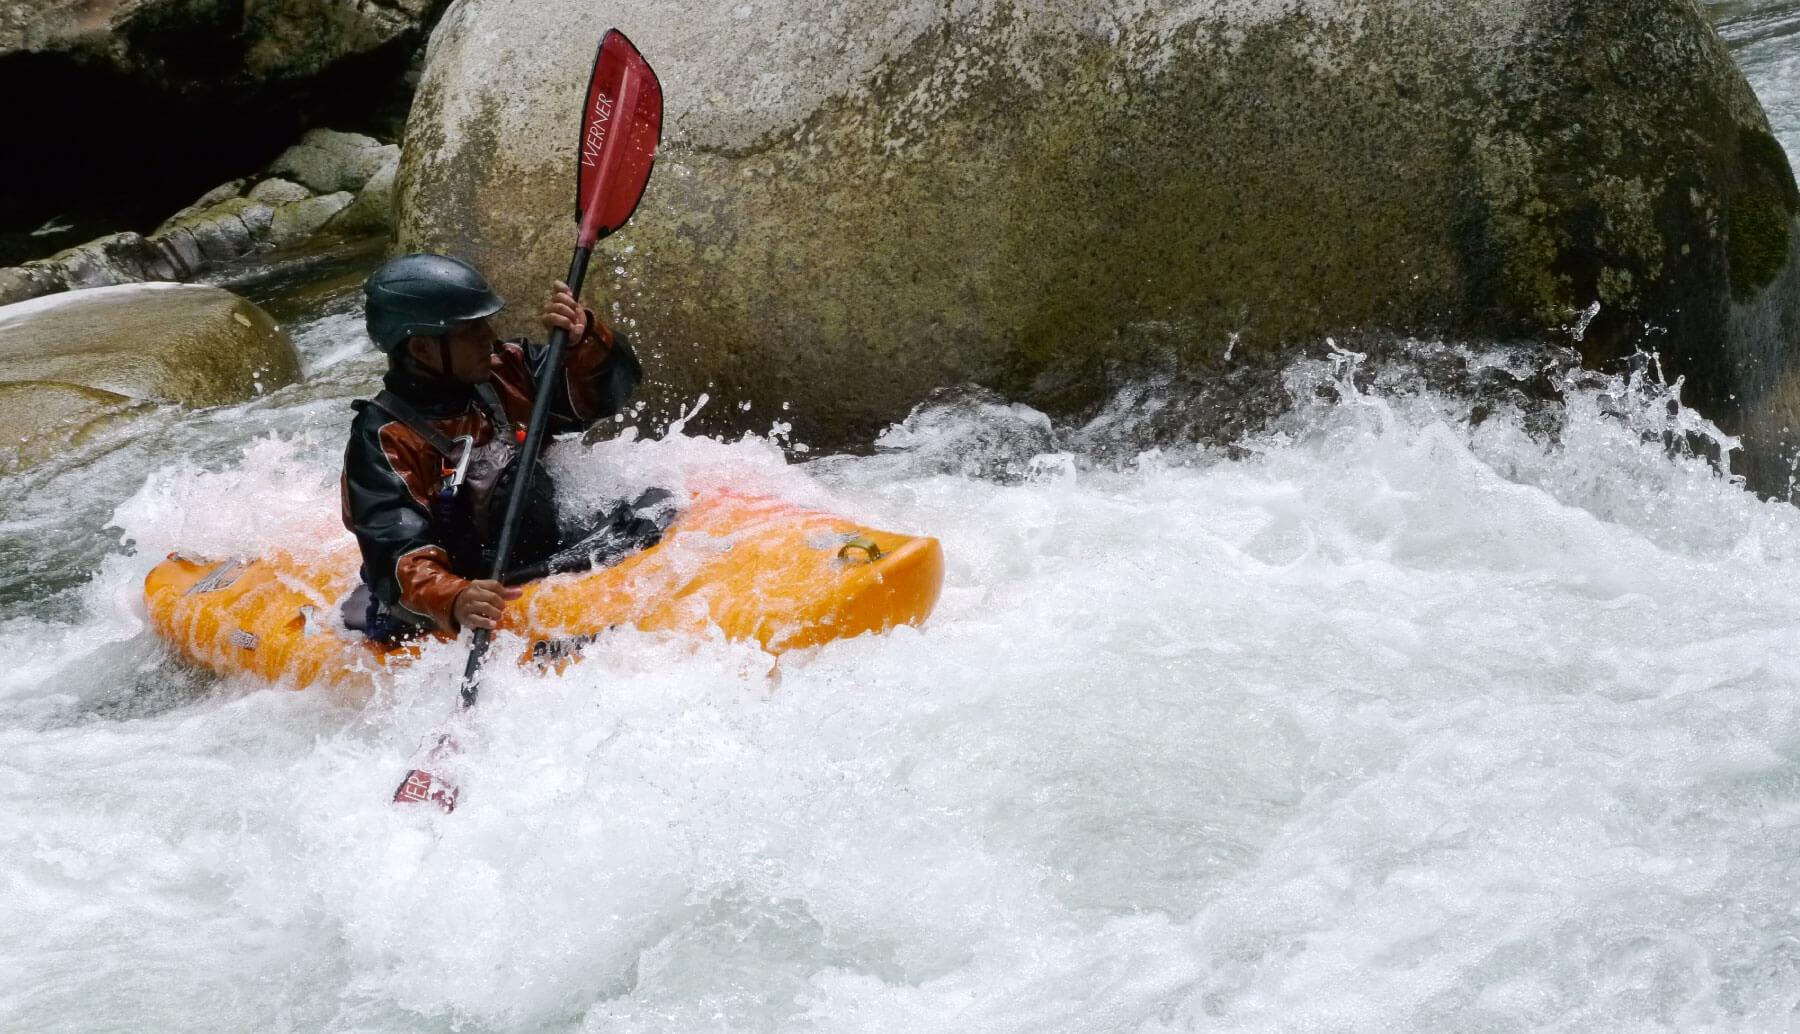 Kayaker maneuvering rapids in Ecuador